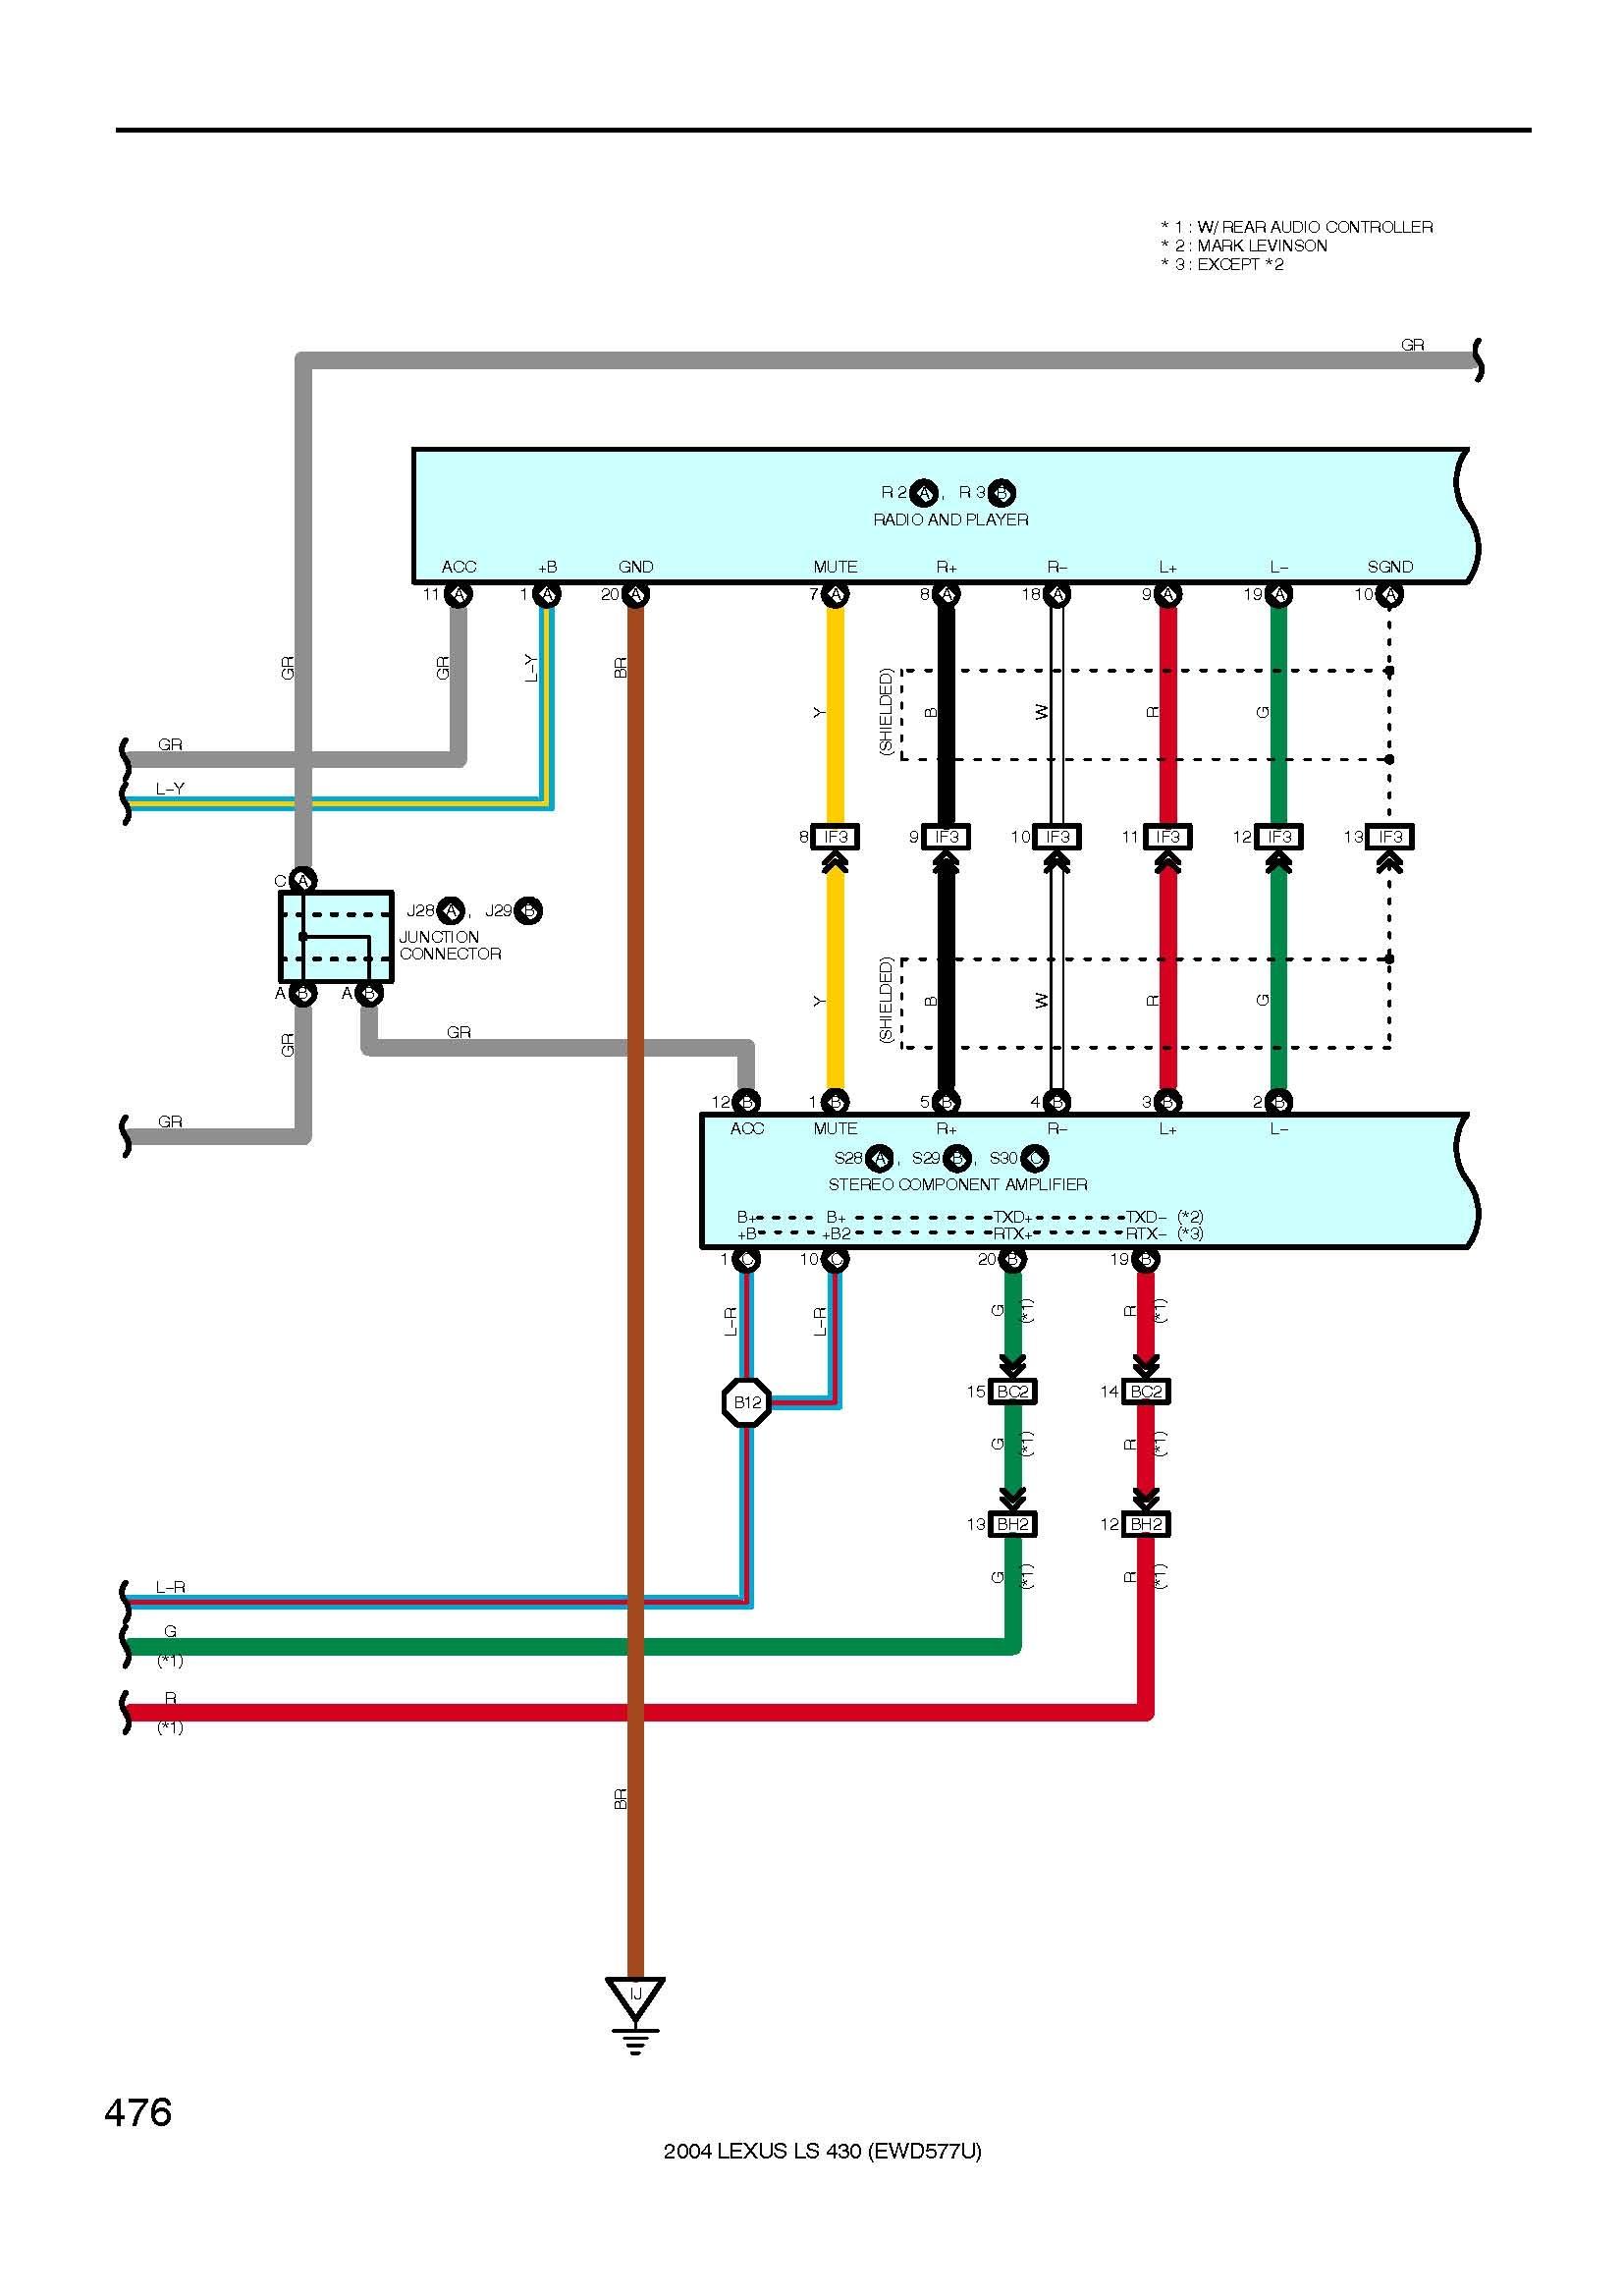 Lexus Stereo Wiring Diagram | Free Wiring Diagram